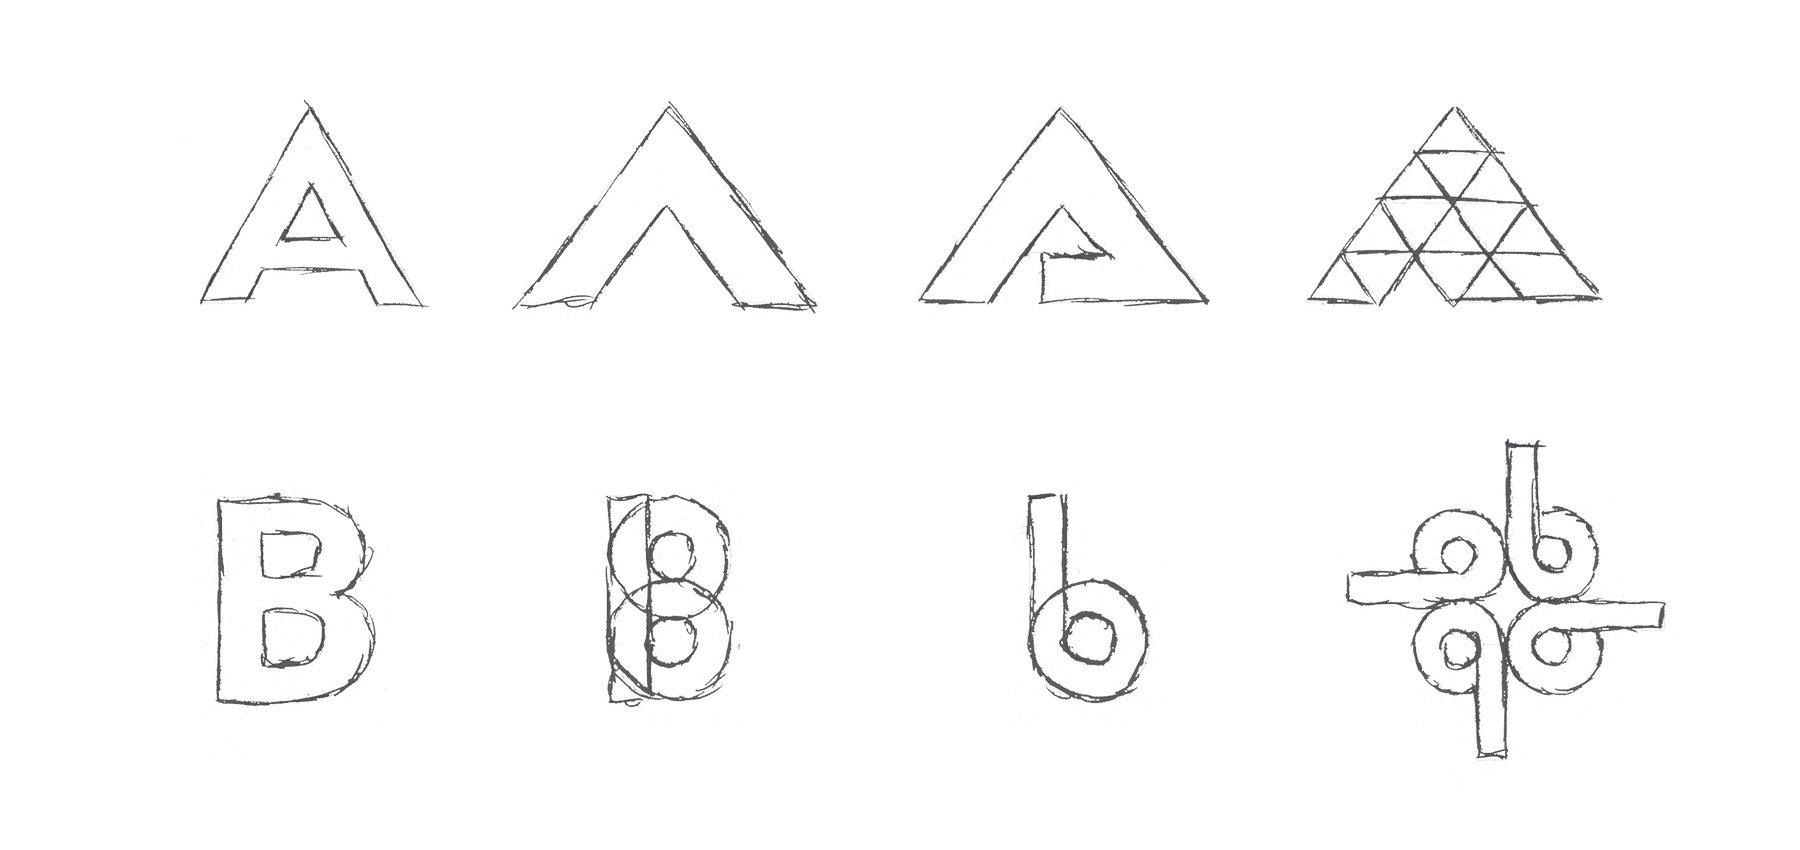 Croquis de 2 concepts de logo fictifs